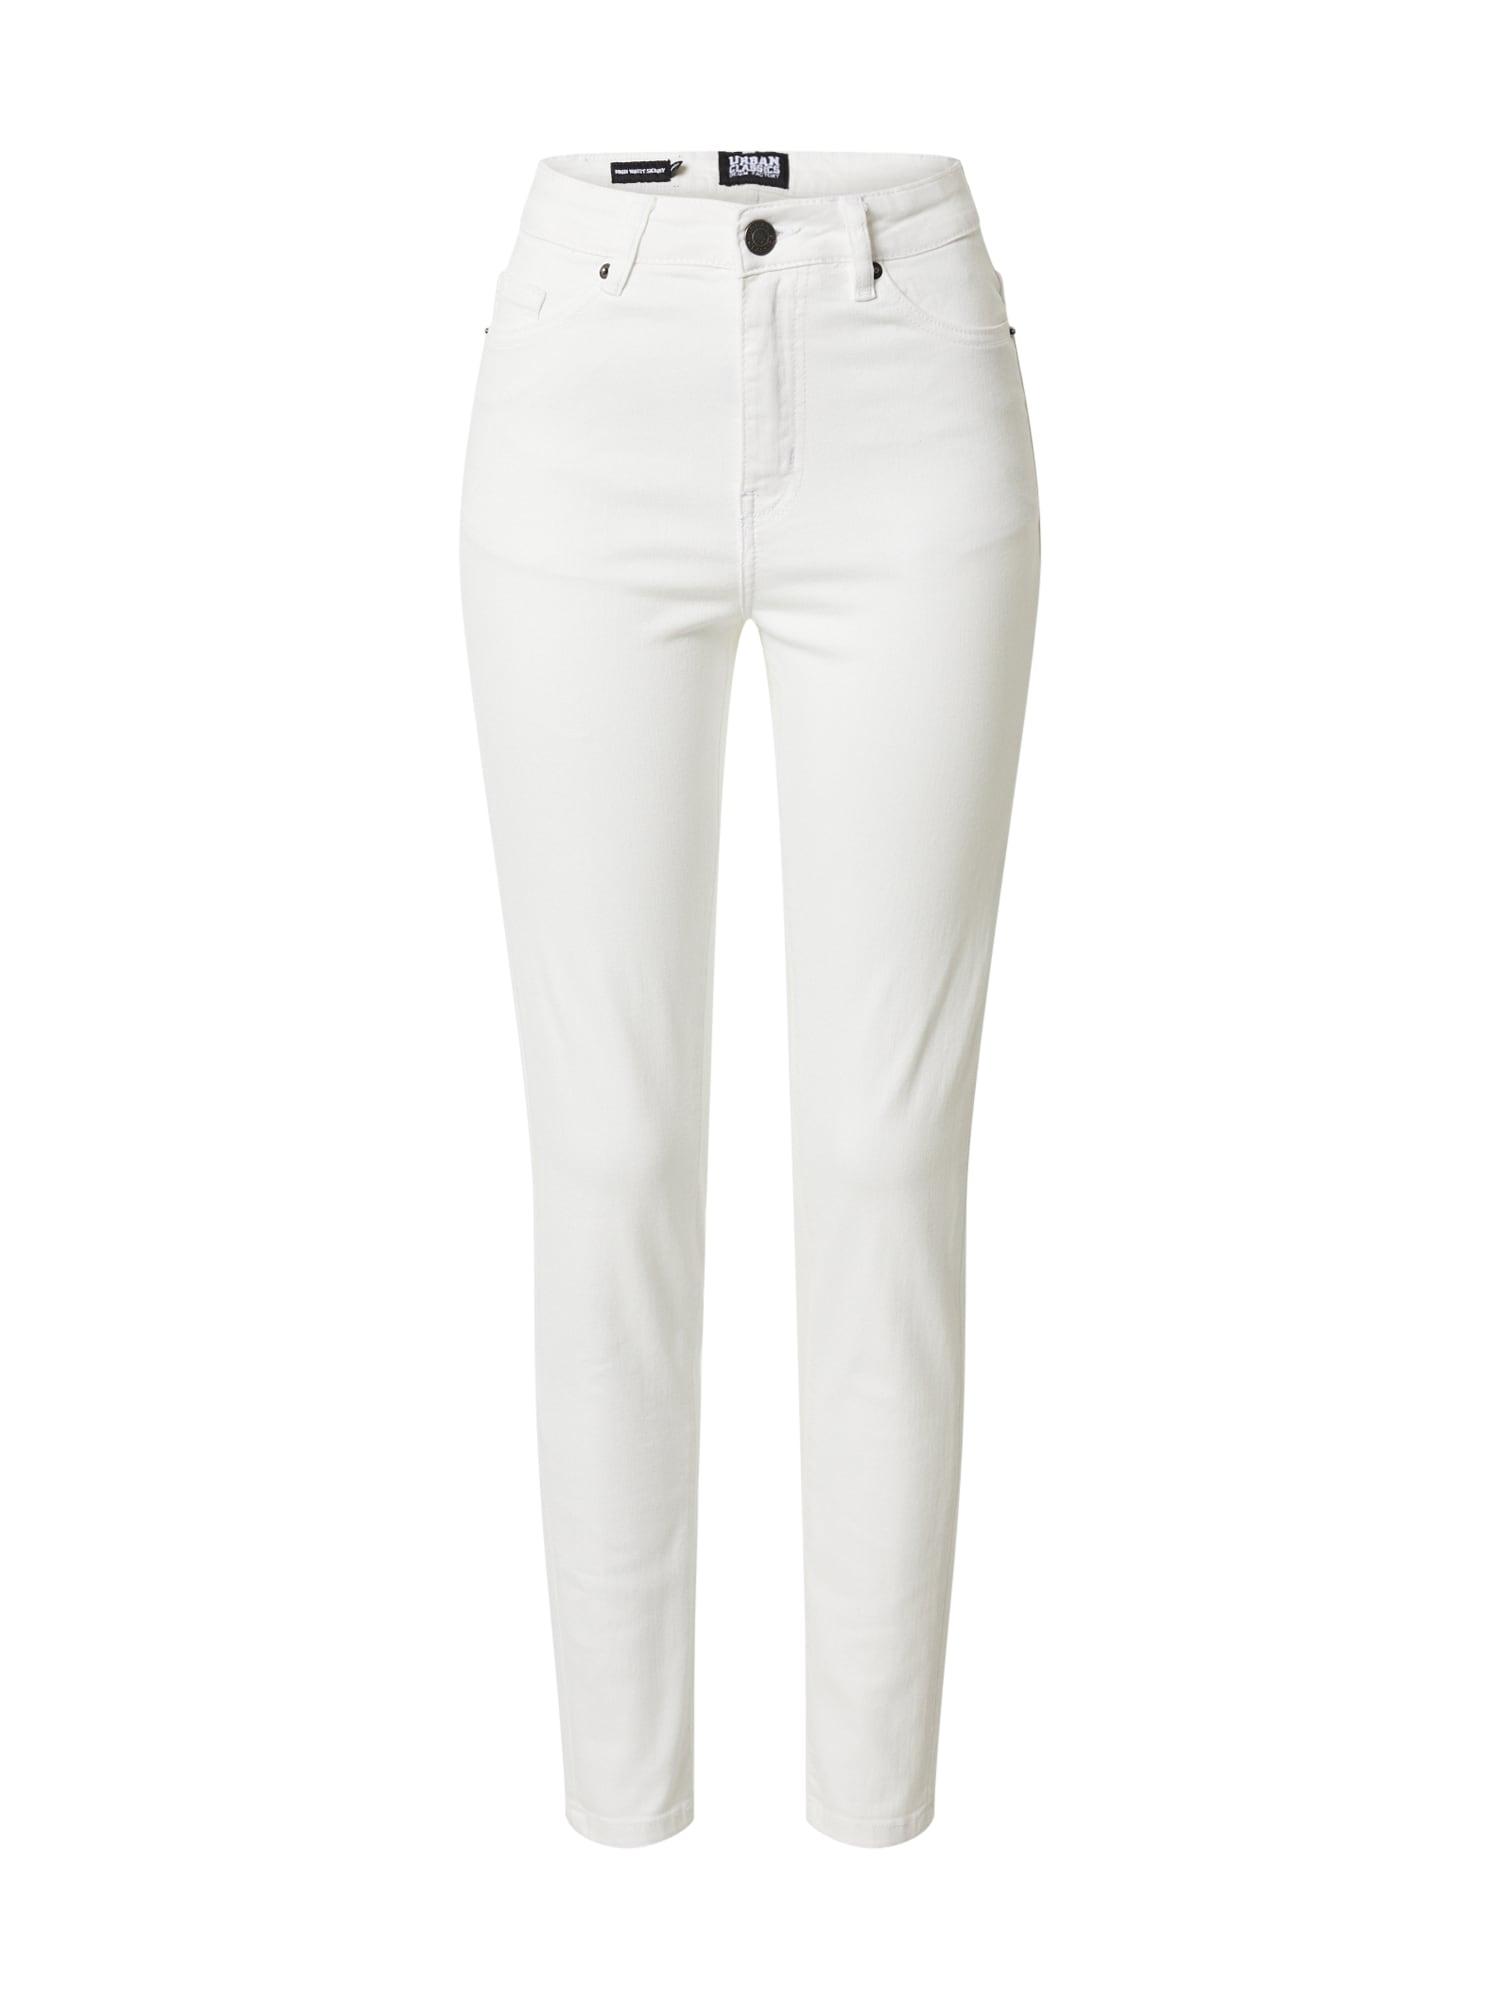 Urban Classics Džínsy 'Ladies High Waist Skinny Jeans'  biela